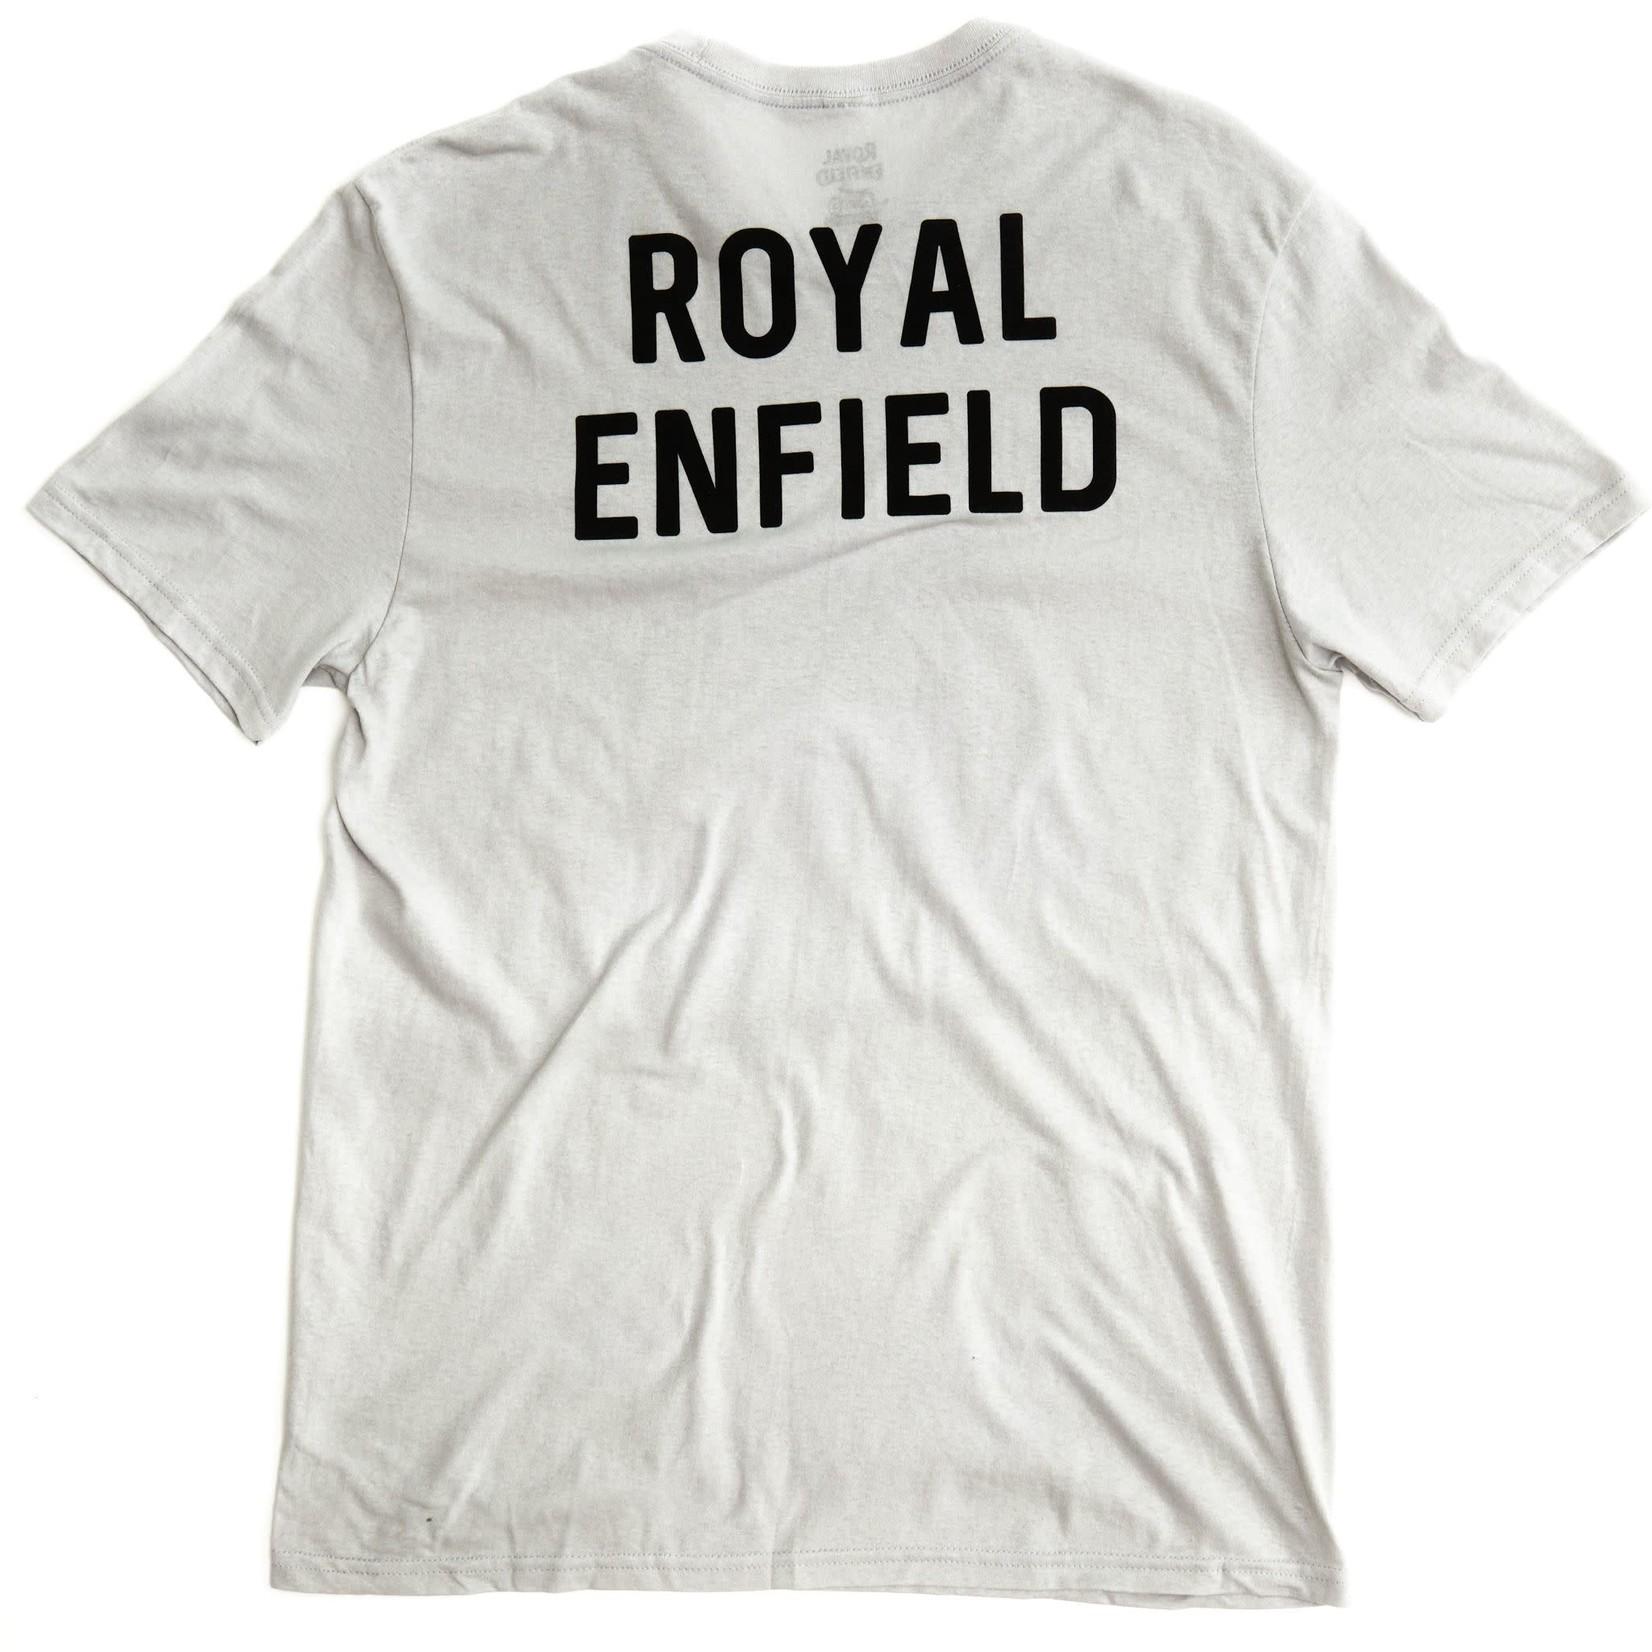 Royal Enfield Himalayan Lifestyle - RE shirt